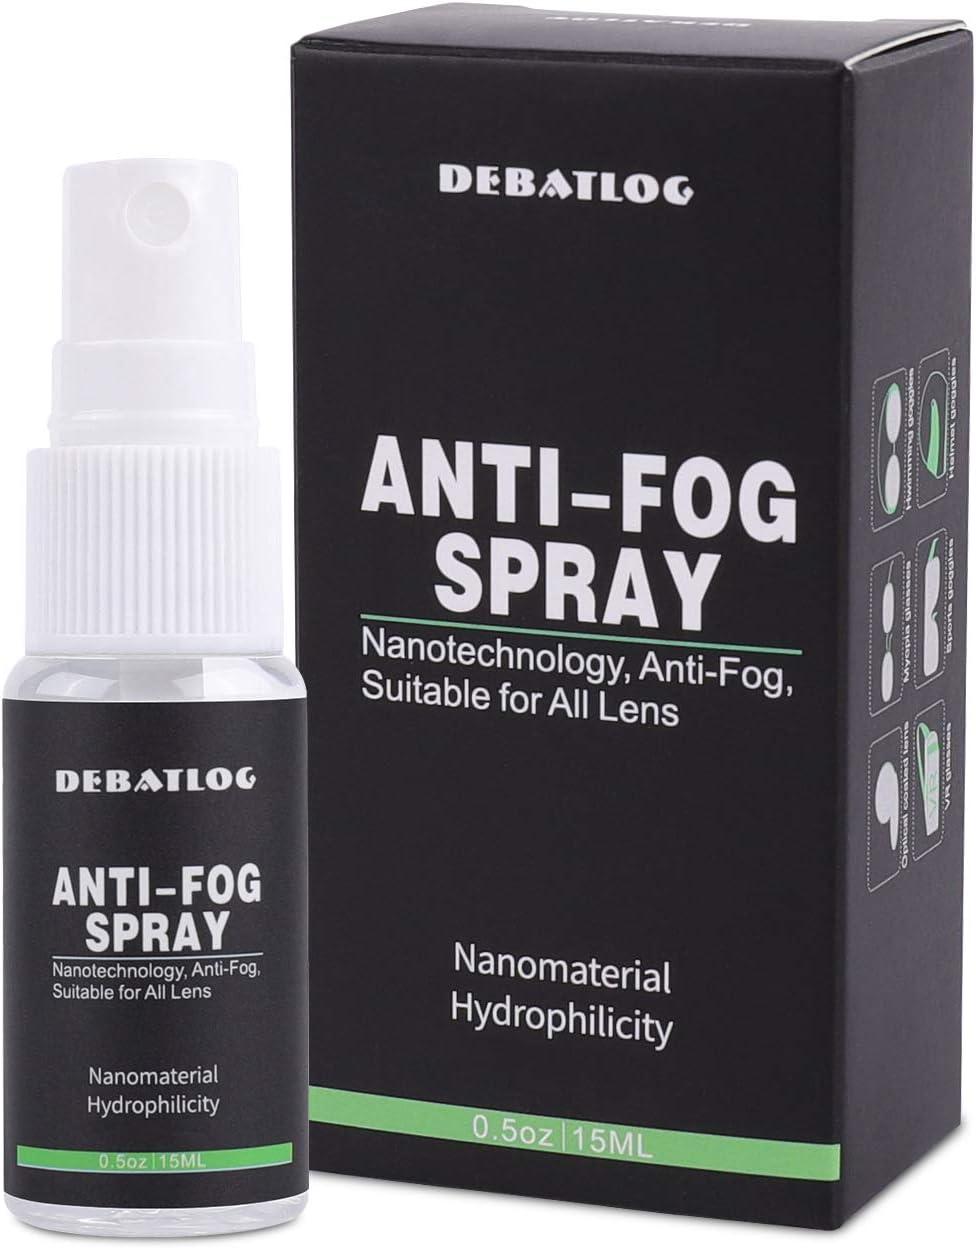 DEBATLOG Anti-Fog Spray for Glasses   Professional   Work on Eyeglass, Mask, Sports Goggles, Swim Goggles, Bathroom Mirror, Humid Environment, Nanotechnology, Alcohol-Free  Durable Anti-Fog : Sports & Outdoors